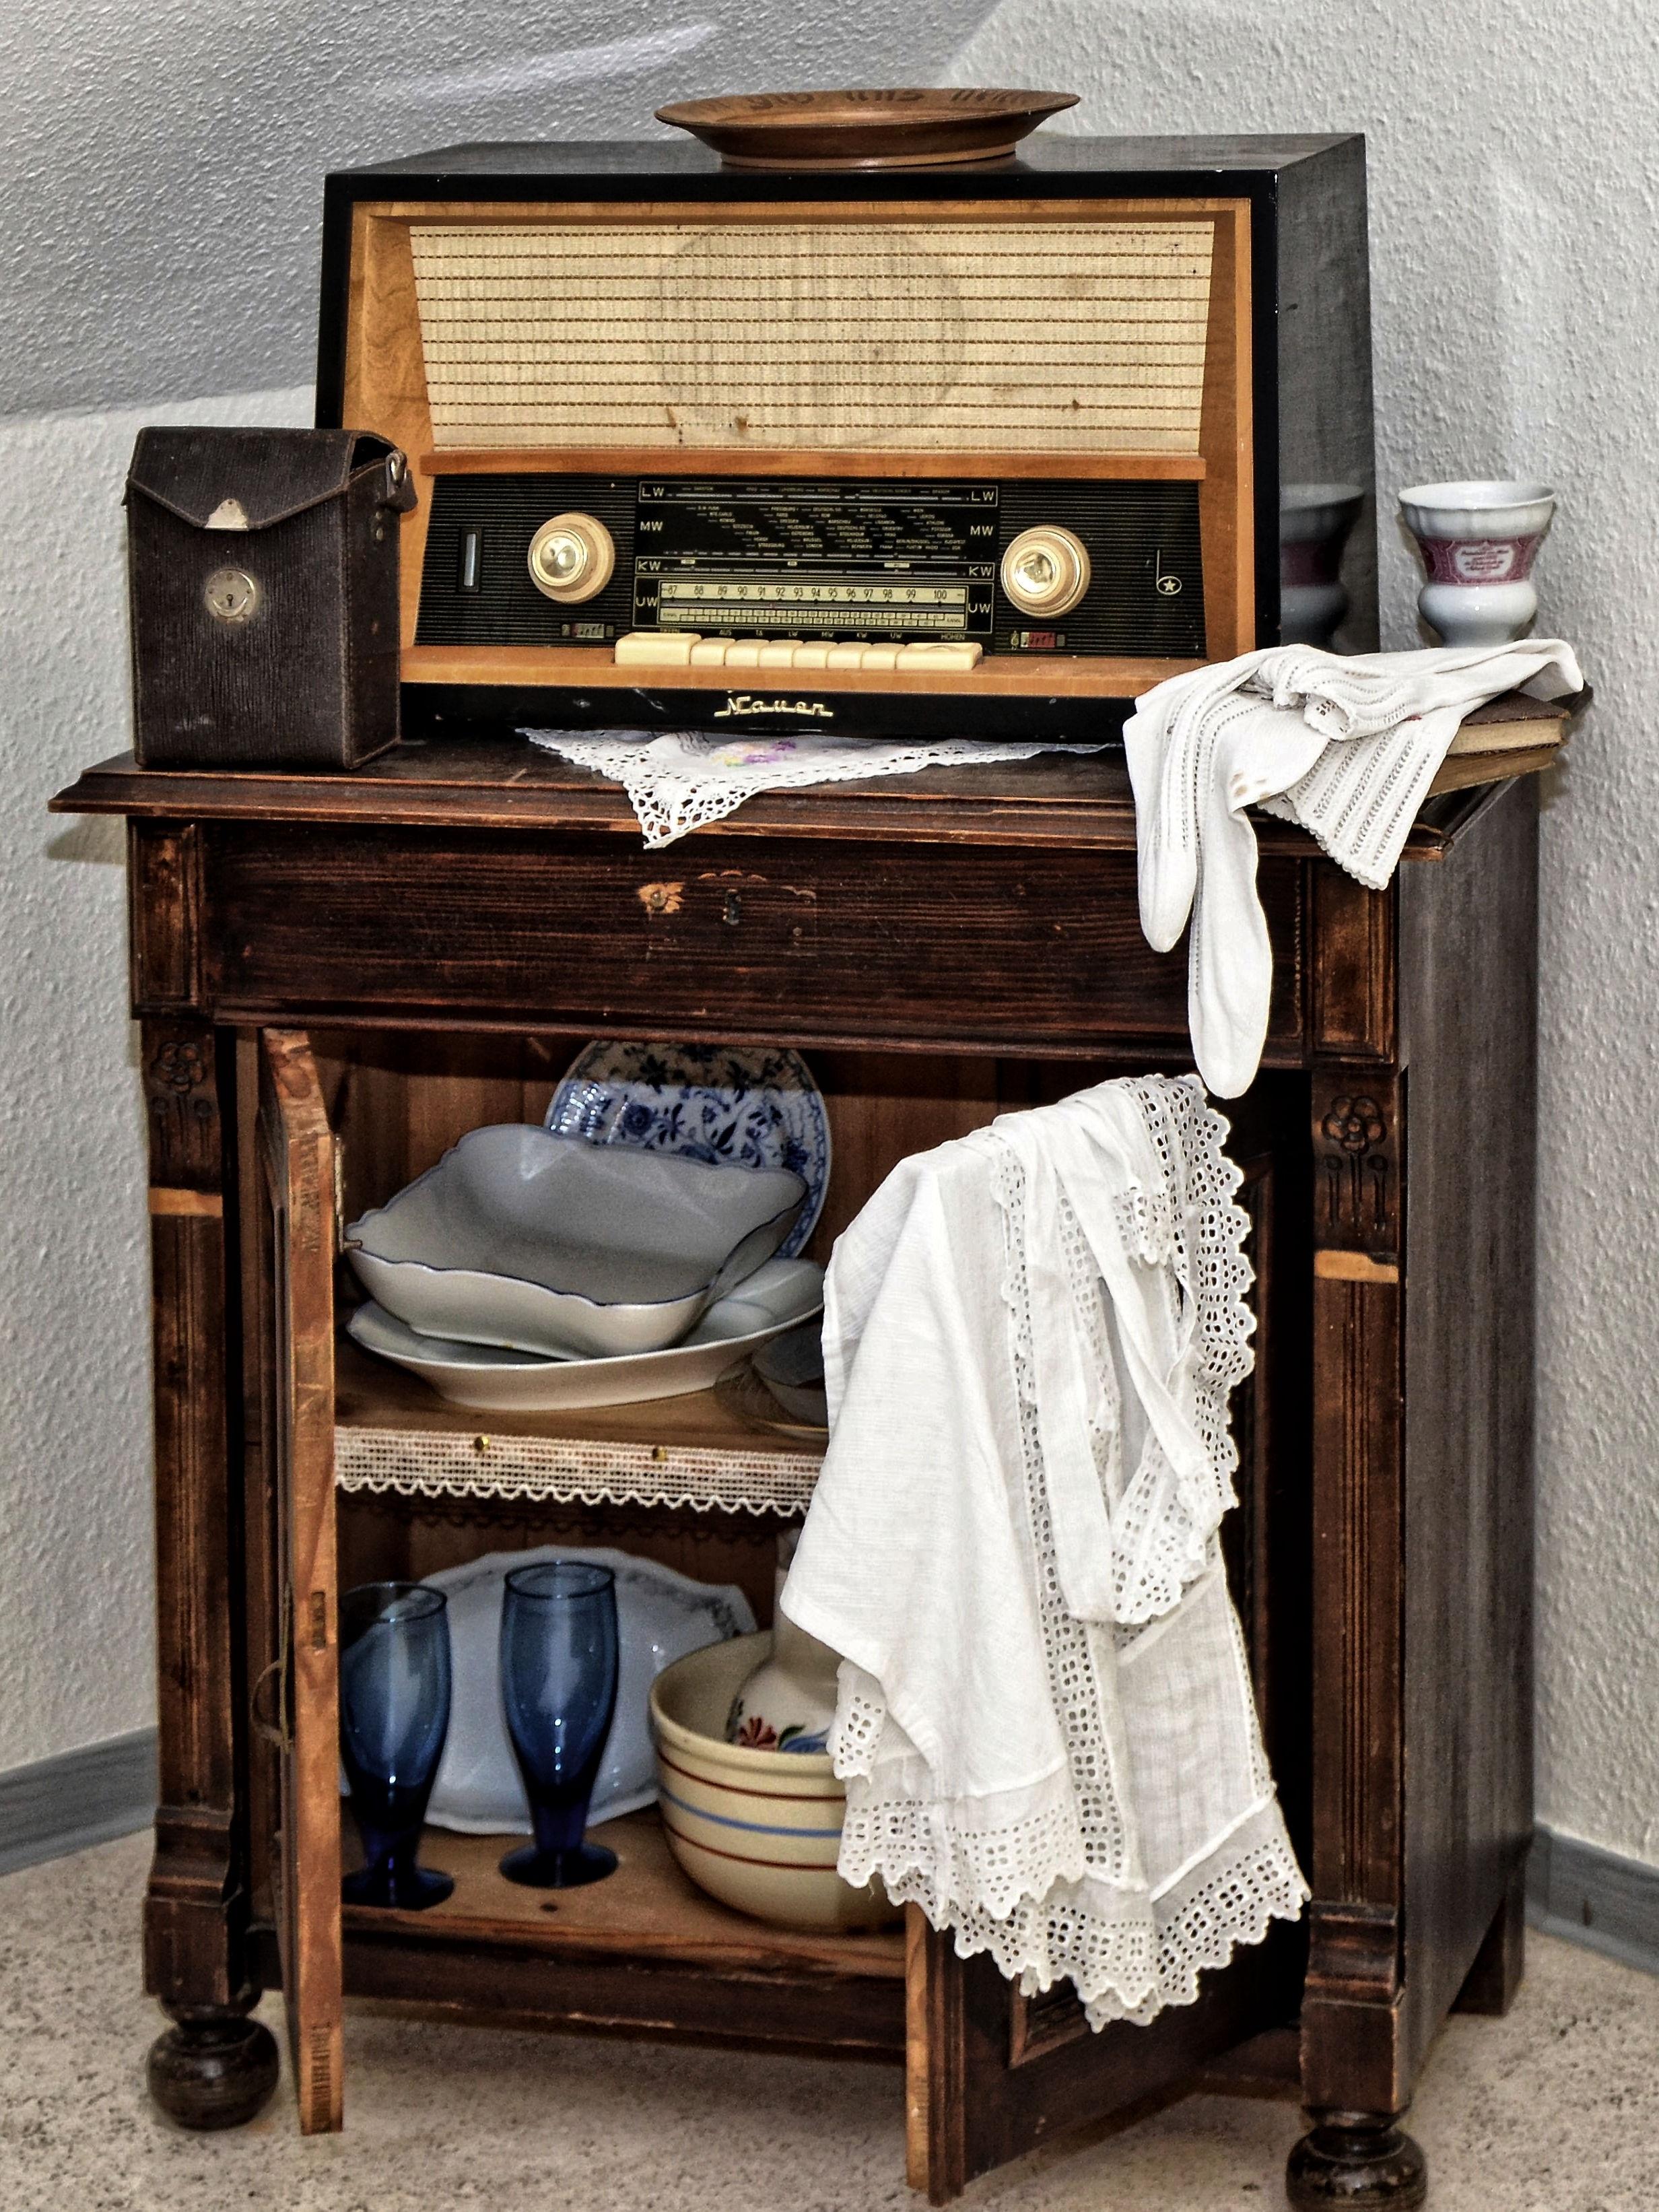 Fotos gratis : mesa, madera, antiguo, nostalgia, mueble, habitación ...